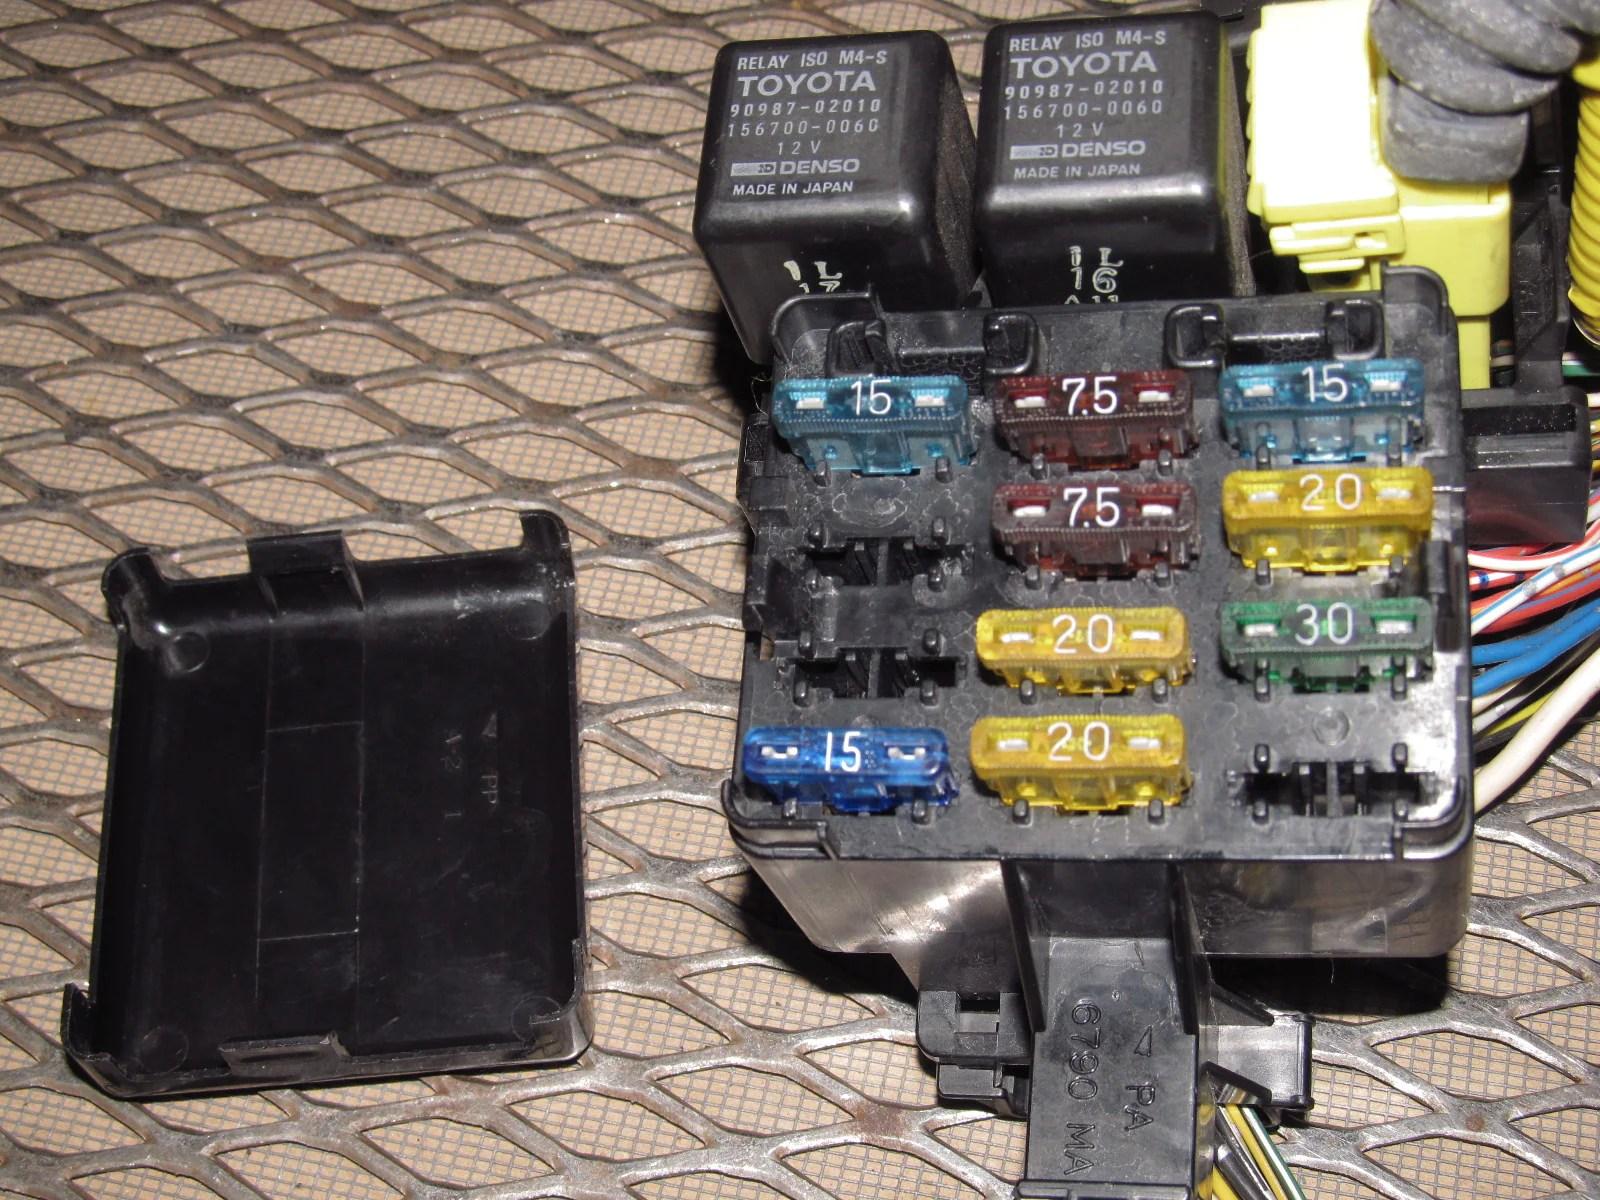 91 92 93 94 95 toyota mr2 oem interior dash fuse box u2013 autopartone com91 [ 1600 x 1200 Pixel ]